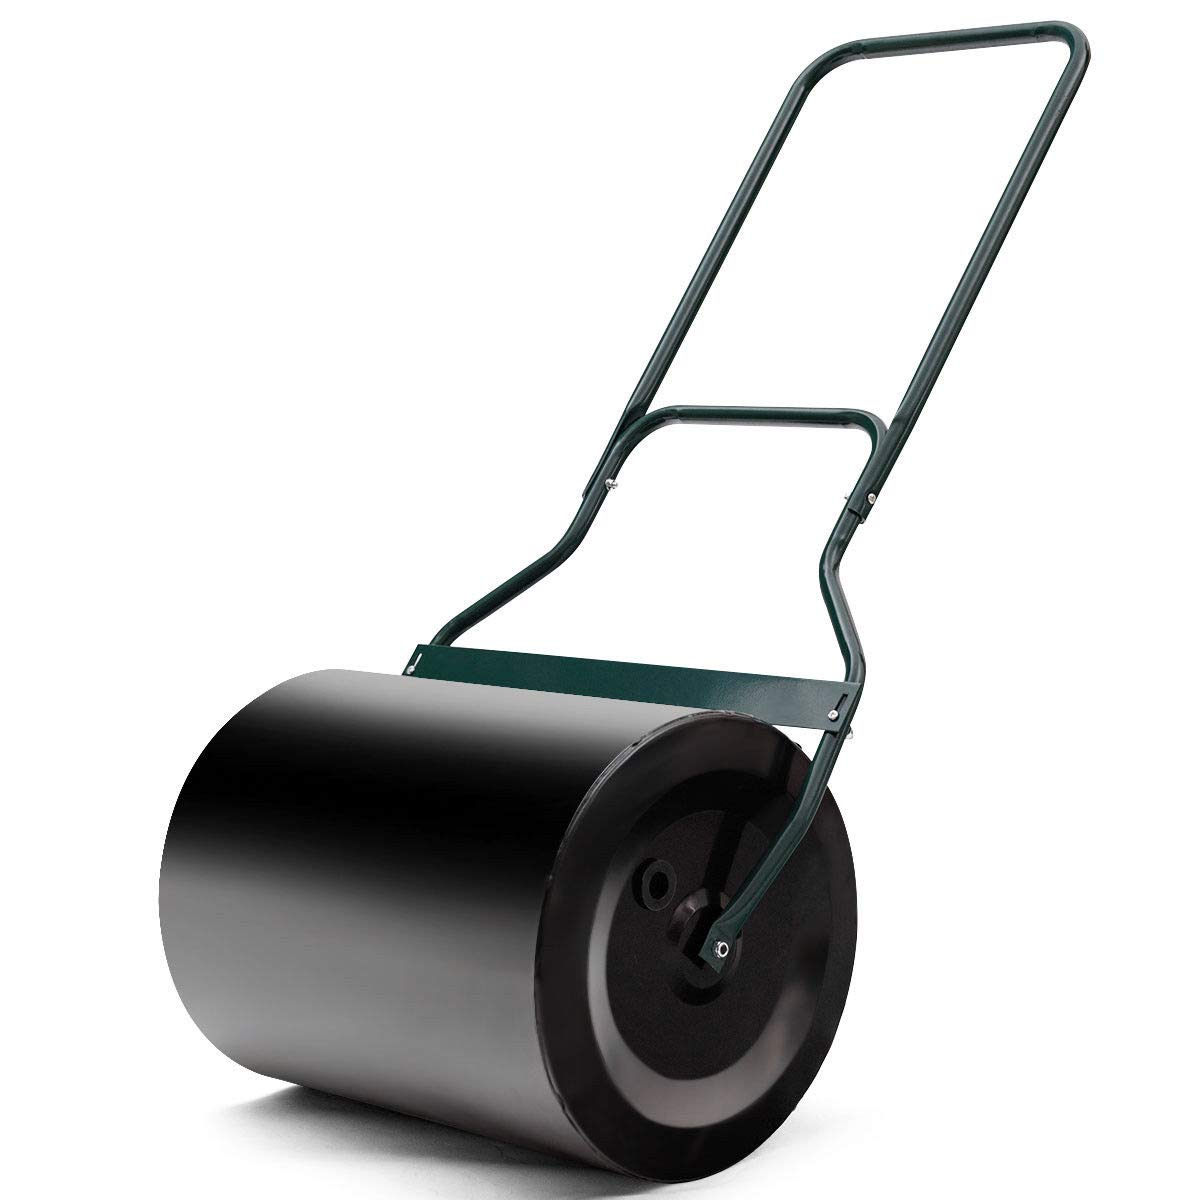 AyaMastro 16-Gallon Garden Push Tow Lawn Poly Roller w/U-Handle with Ebook